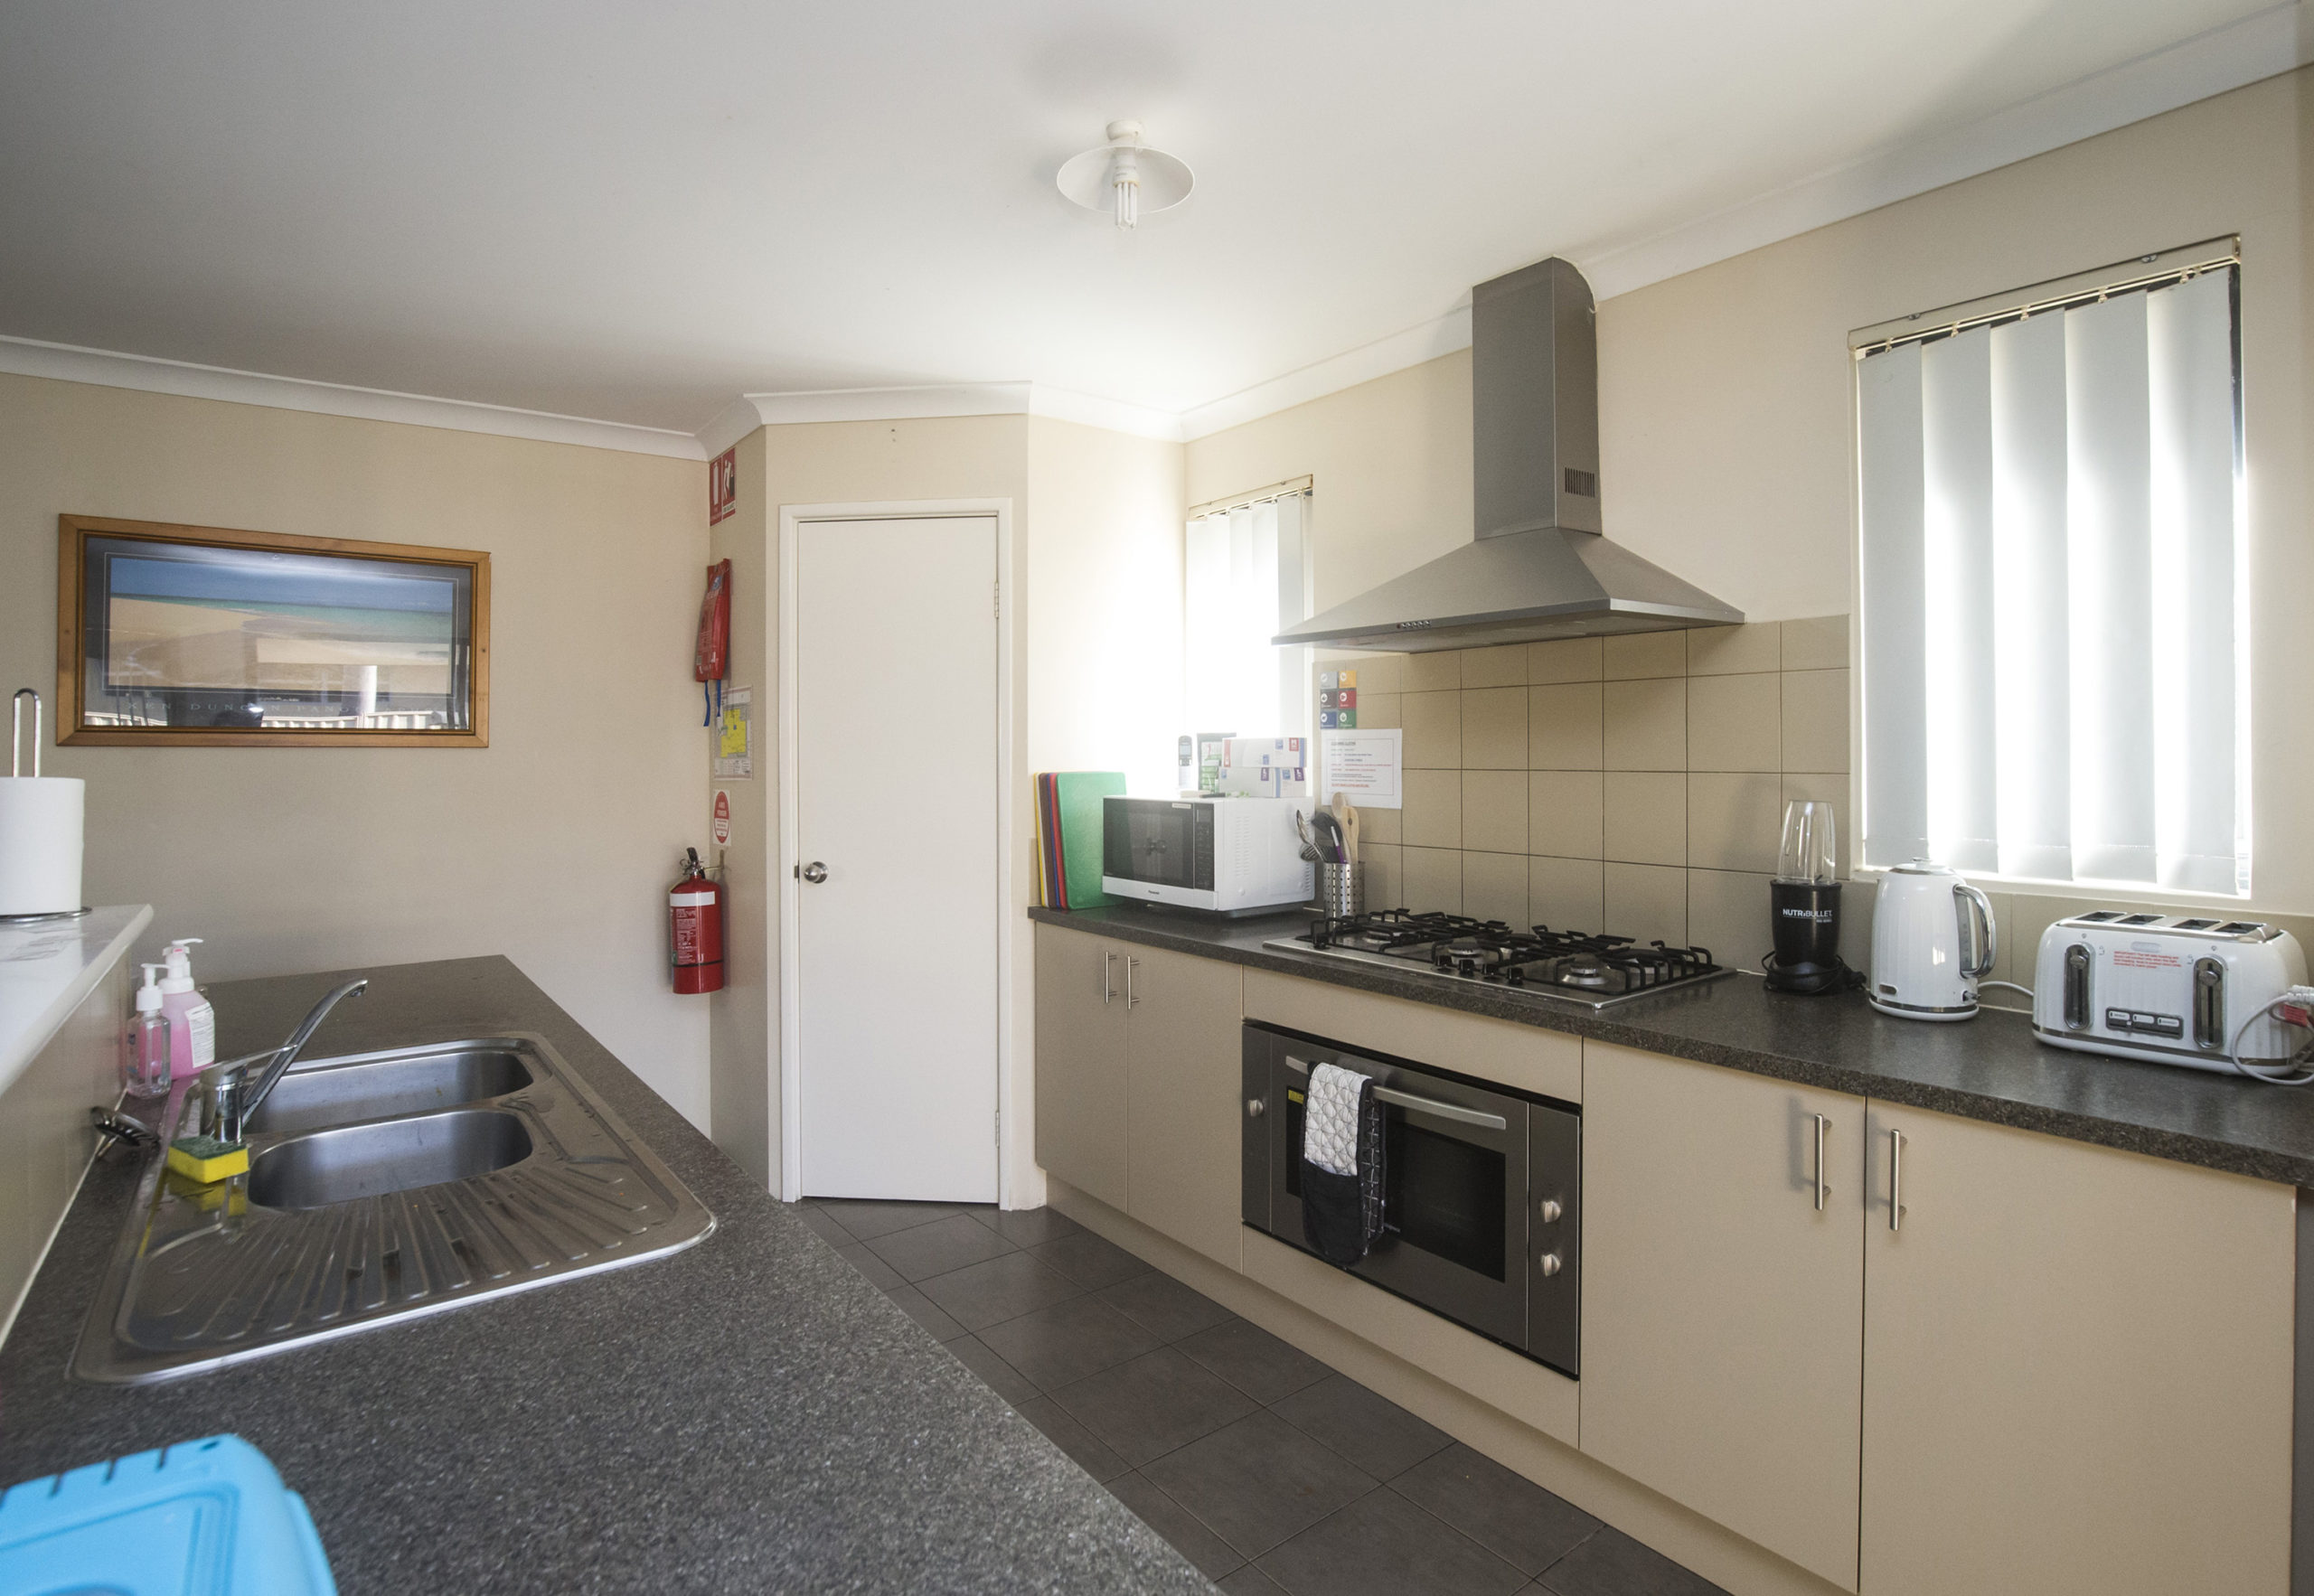 Swan view vacancy image - kitchen